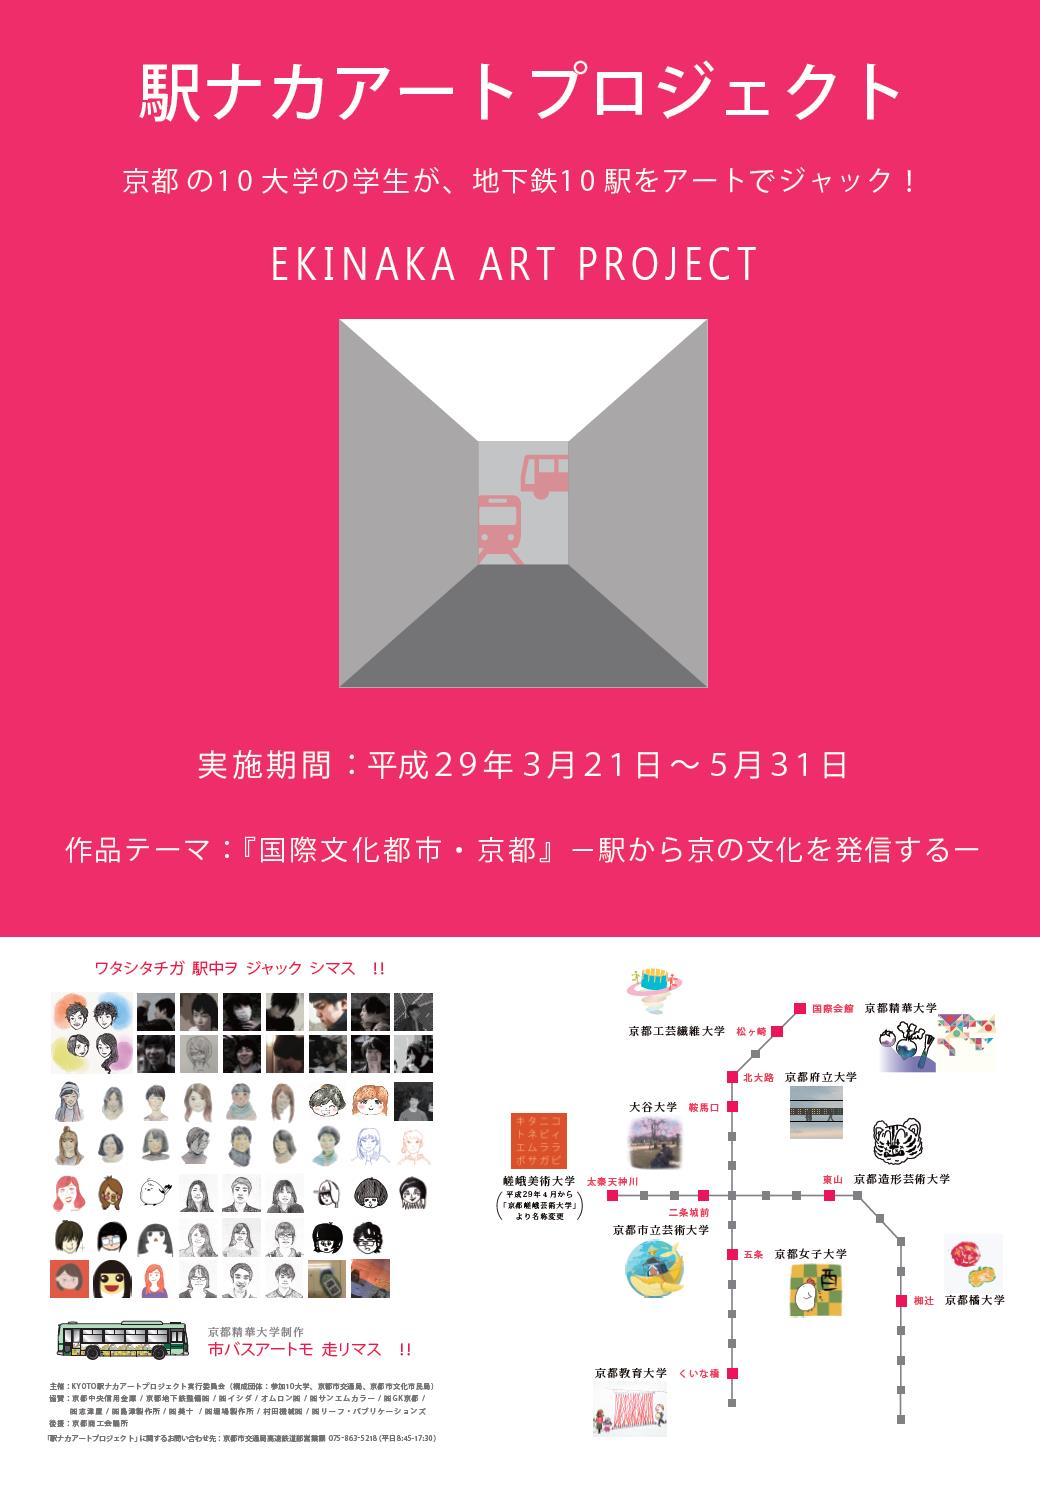 KYOTO駅ナカアートプロジェクトに大谷大学人文情報学科の学生が参加 -- 駅ナカアート初となるプロジェクターを使用した動画を取り入れた作品を展示